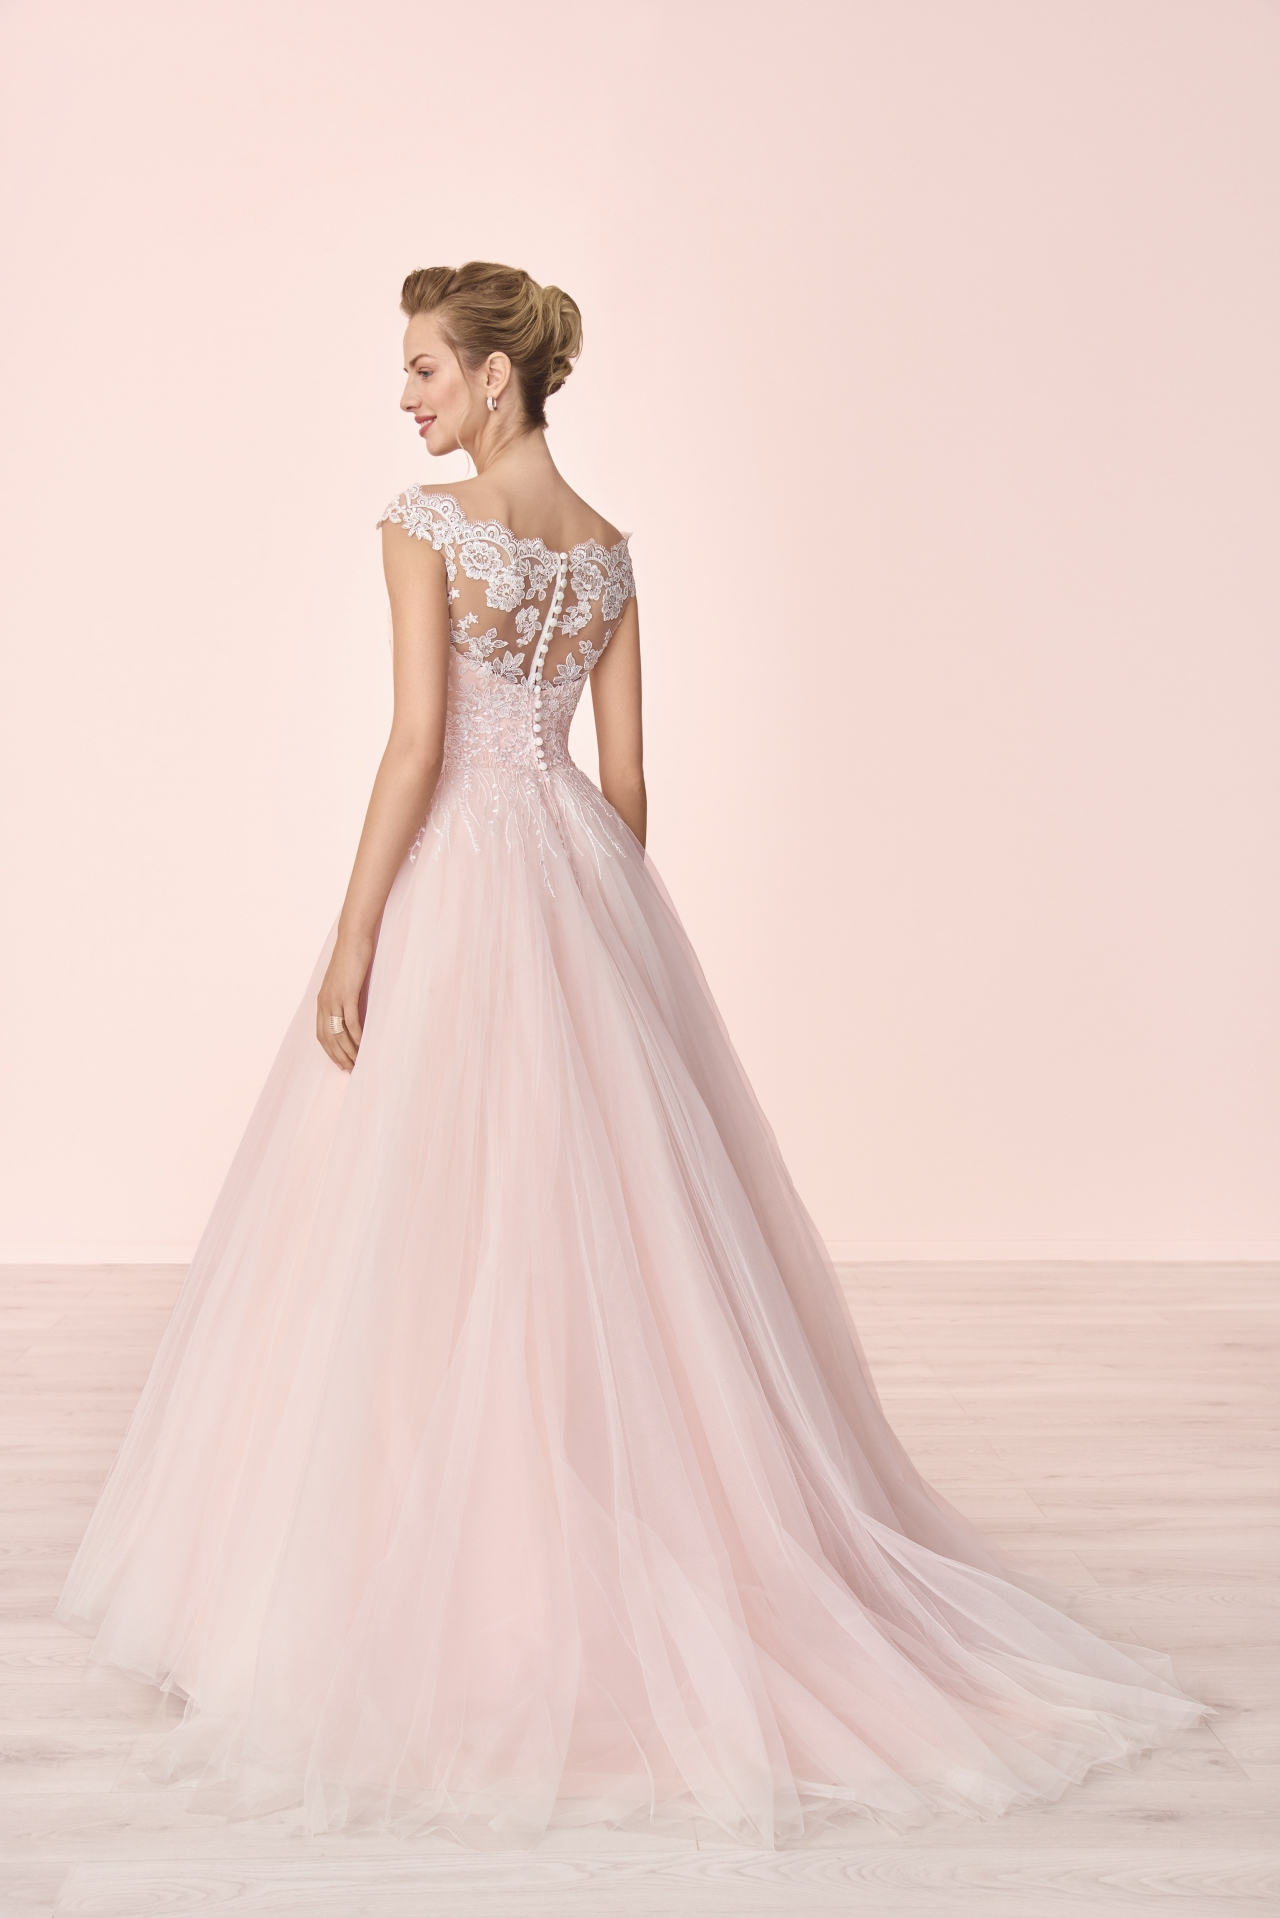 Brautkleid Elizabeth Konin 2019 - 4101T-1